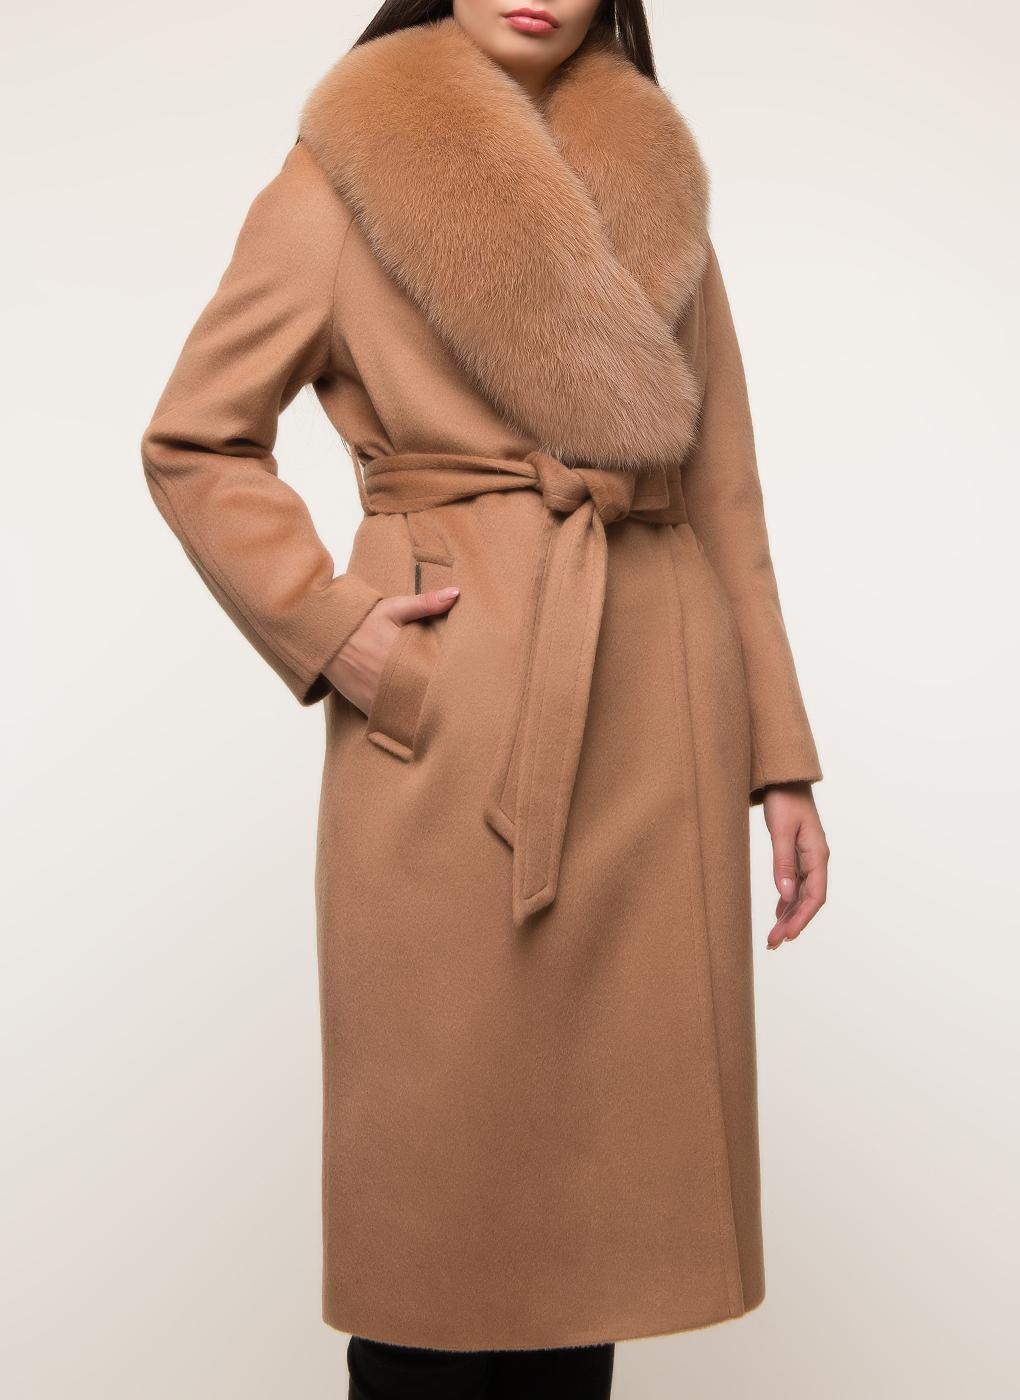 Пальто шерстяное 95, idekka фото